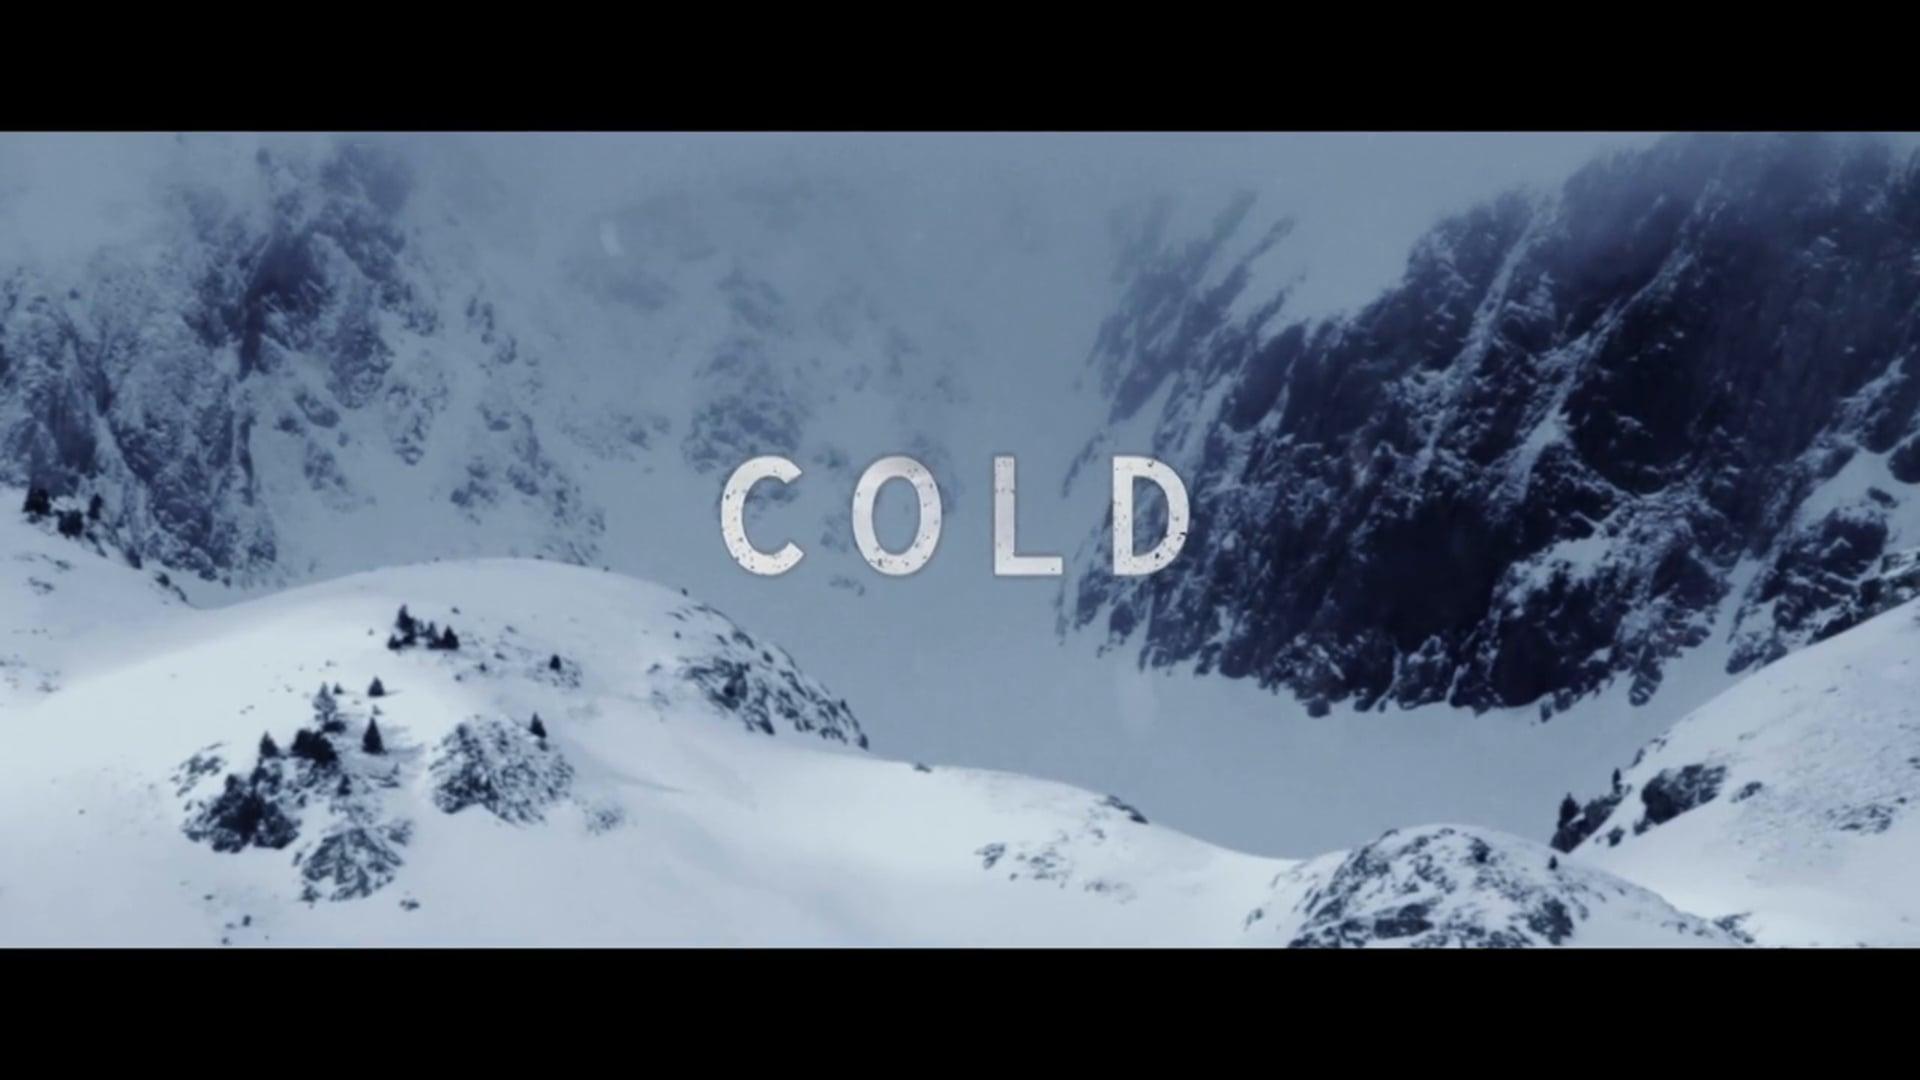 COLD / Cortometraje